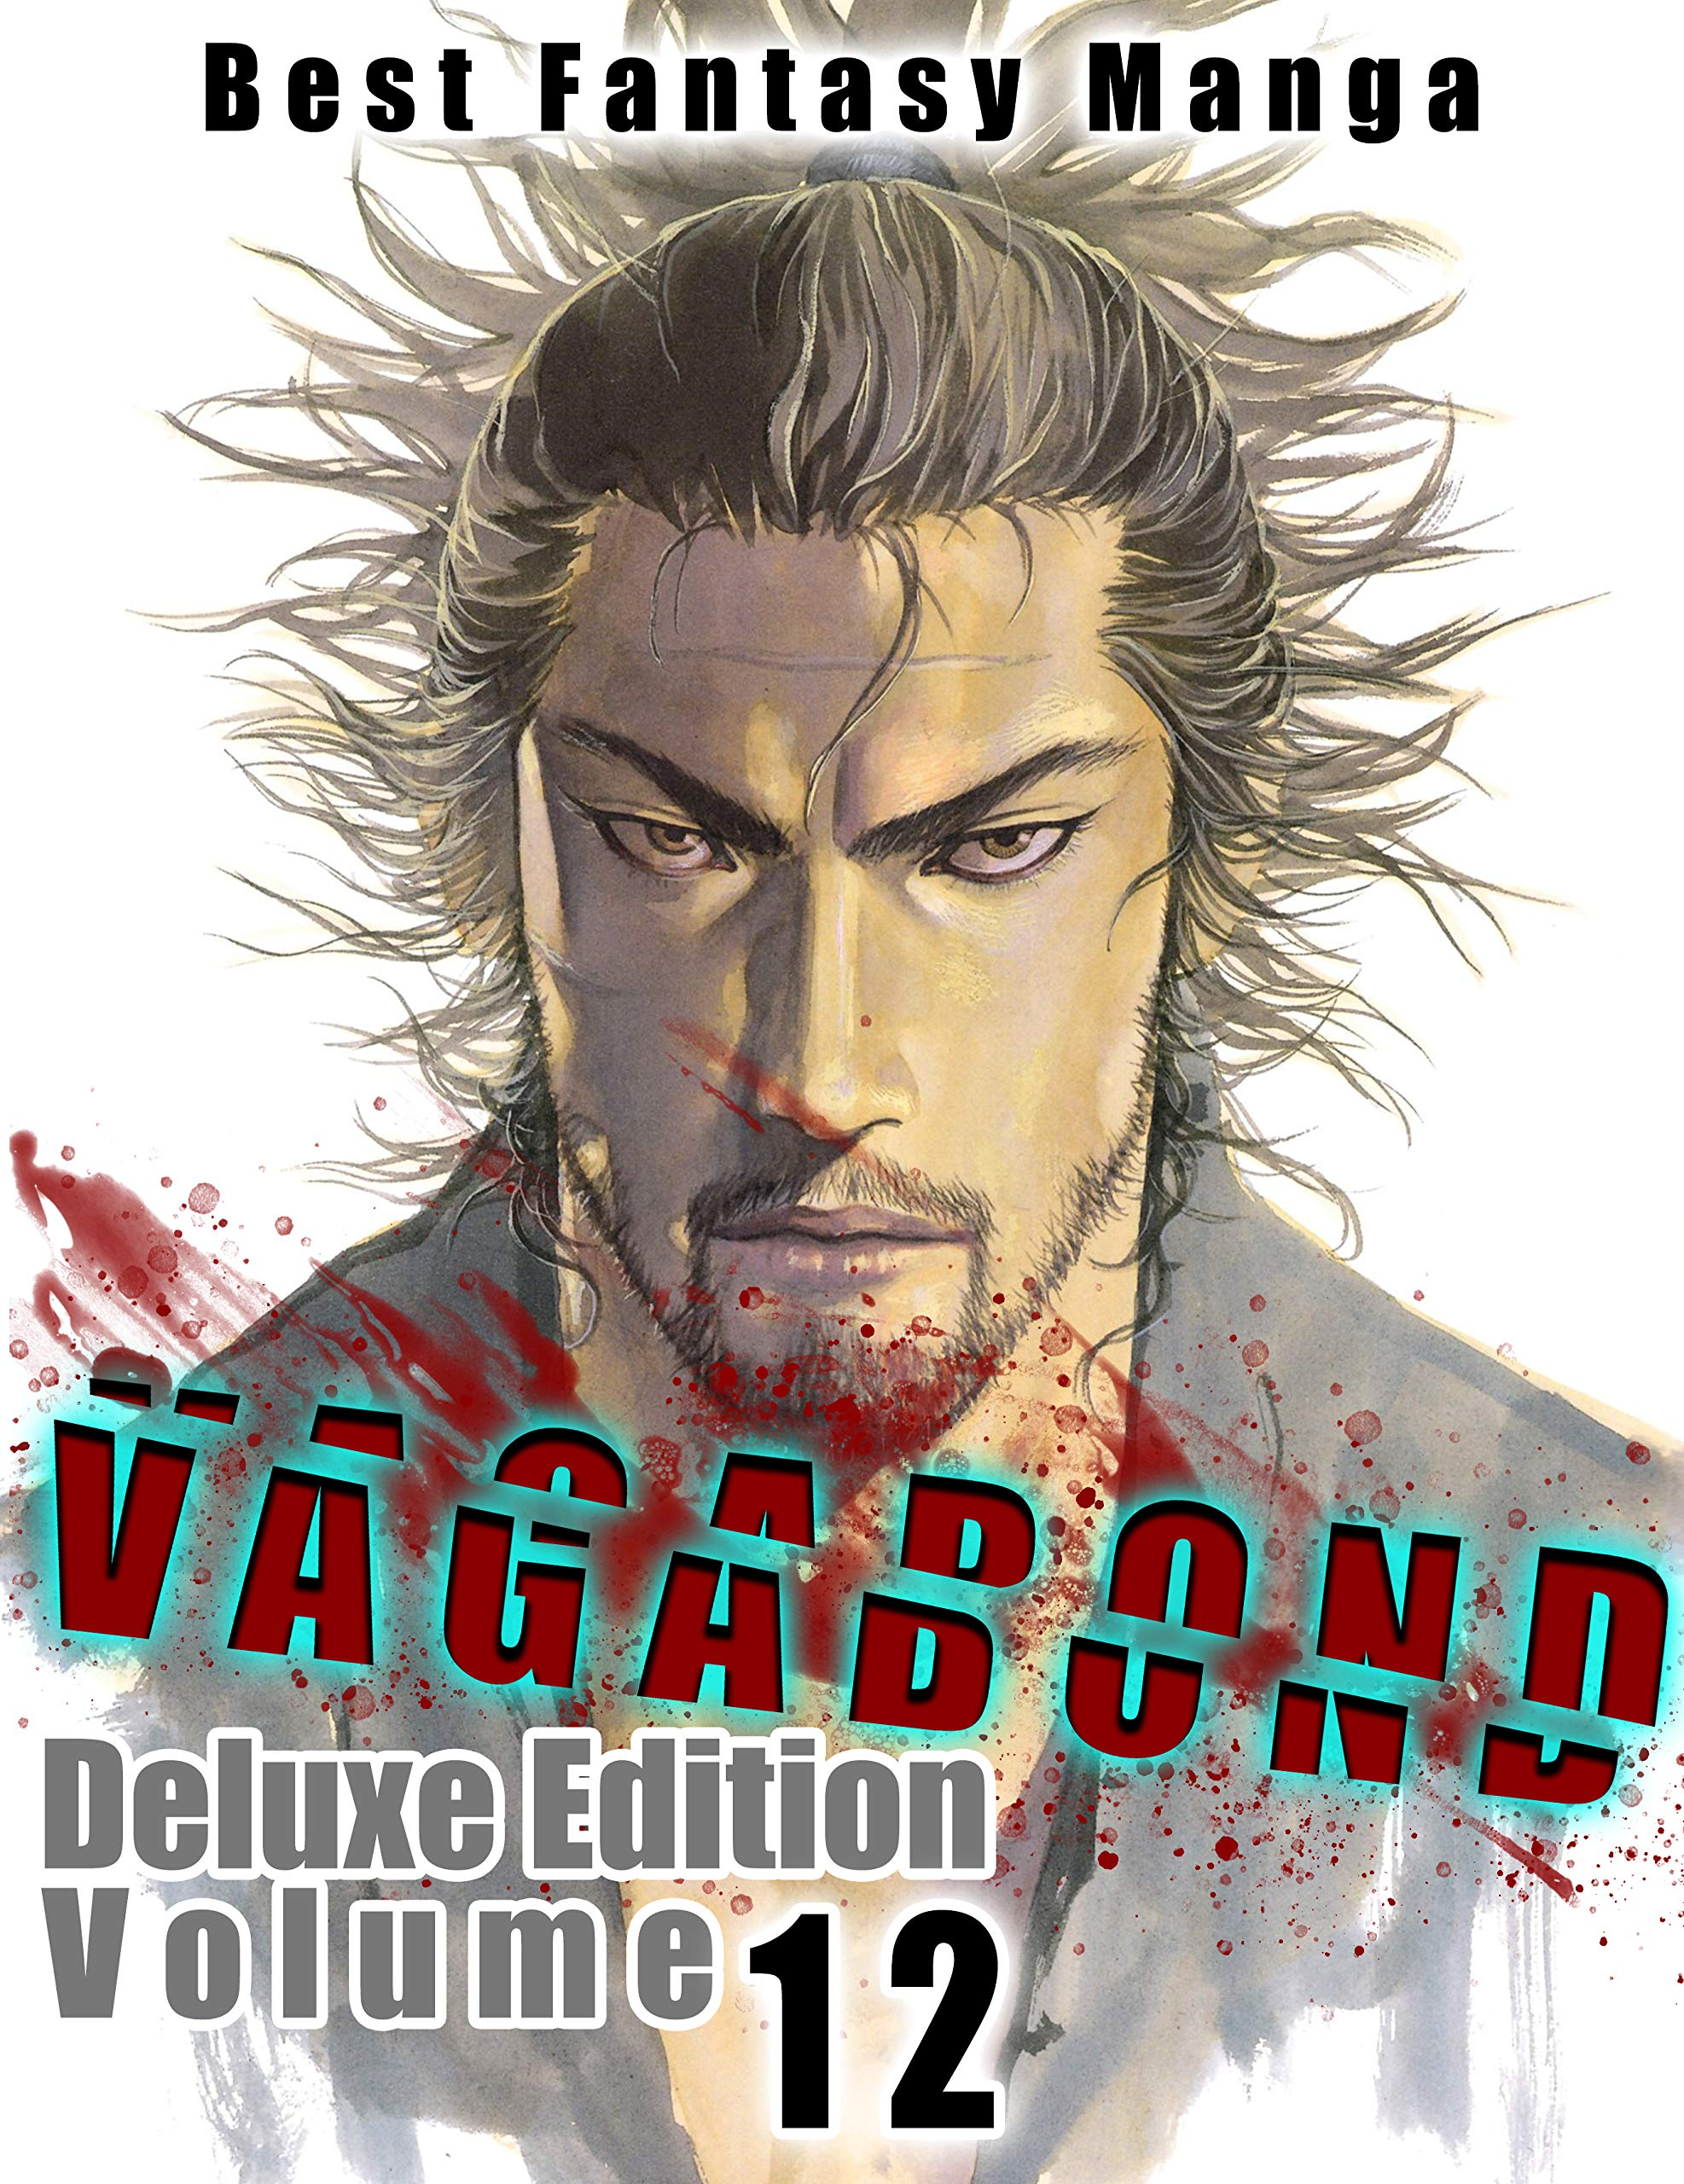 Best Fantasy Manga Vagabond Deluxe Edition: Full Collection Vagabond Volume 12